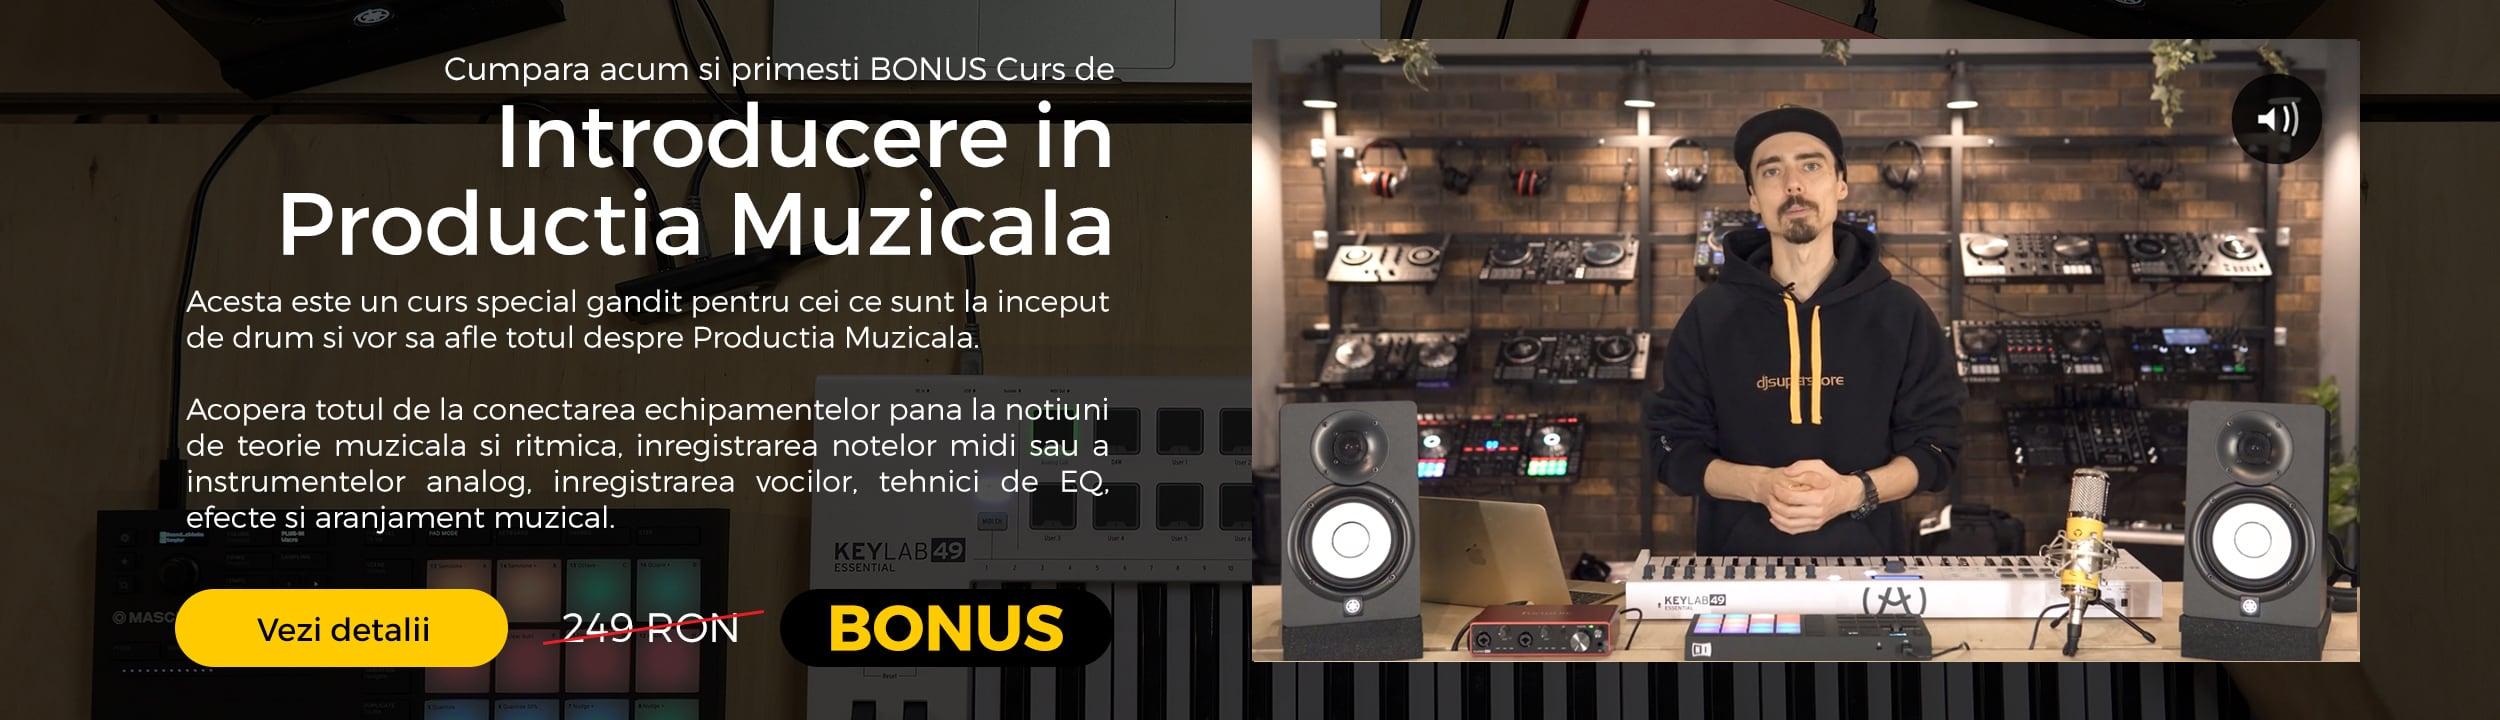 Curs de Introducere in Productia Muzicala